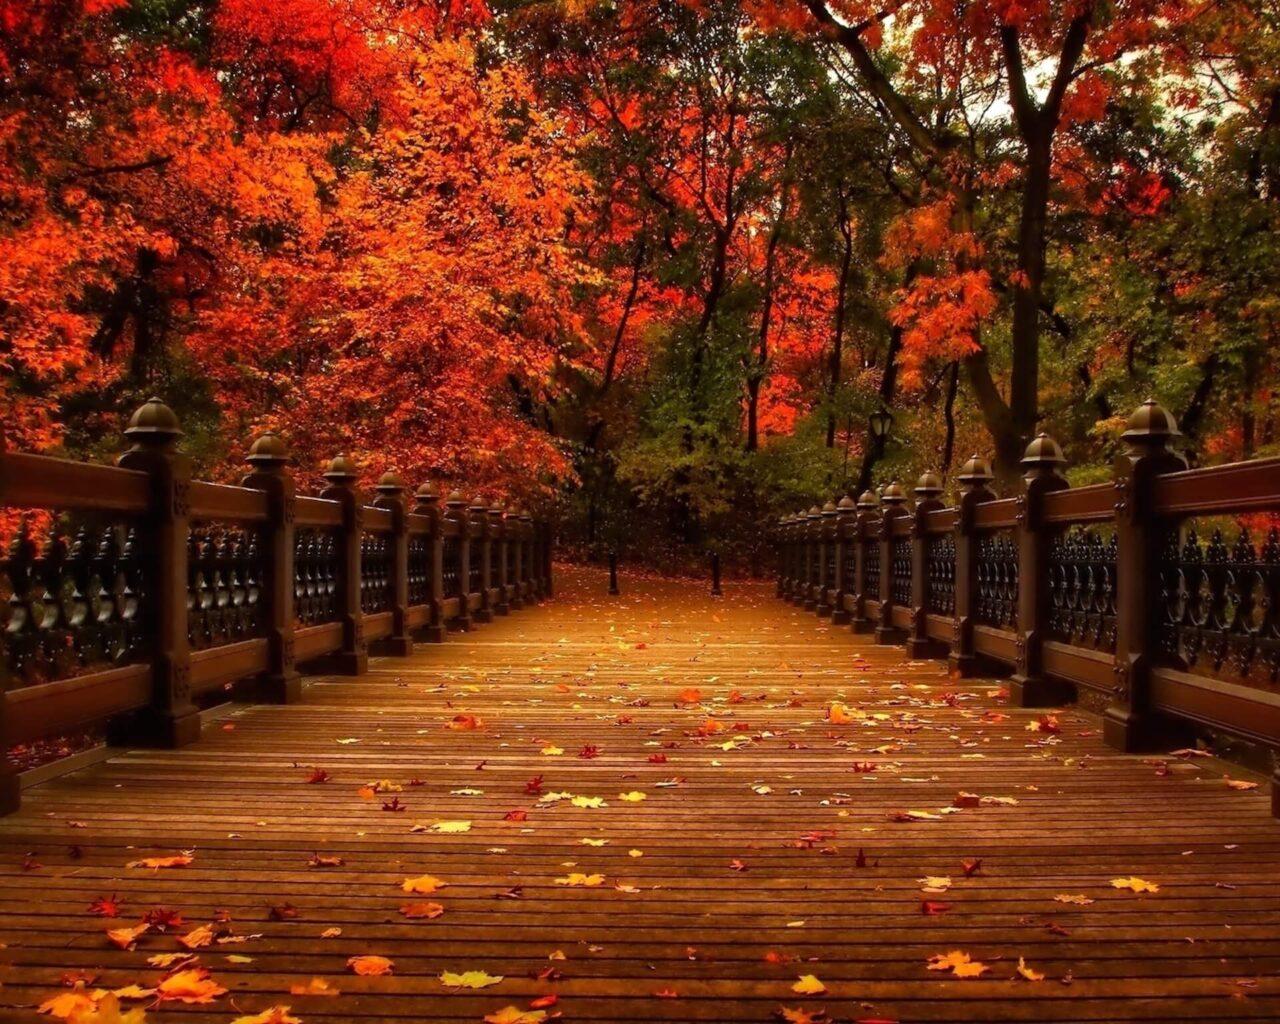 Autumn Park Bridge Wallpaper Free Autumn Downloads